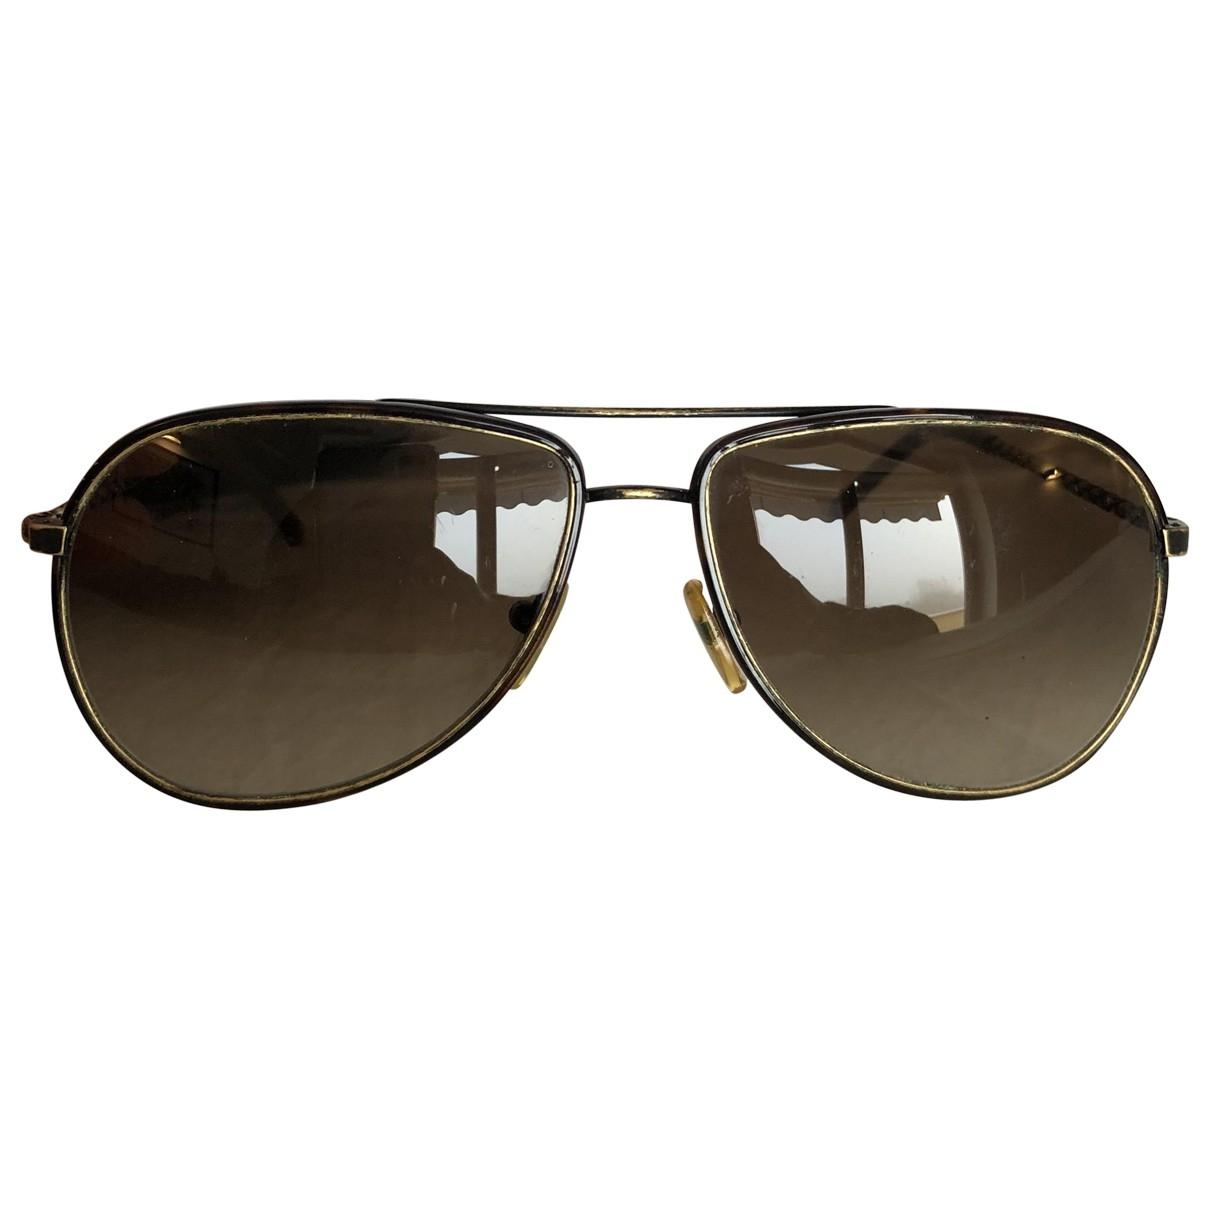 Bottega Veneta \N Sonnenbrillen in  Braun Metall